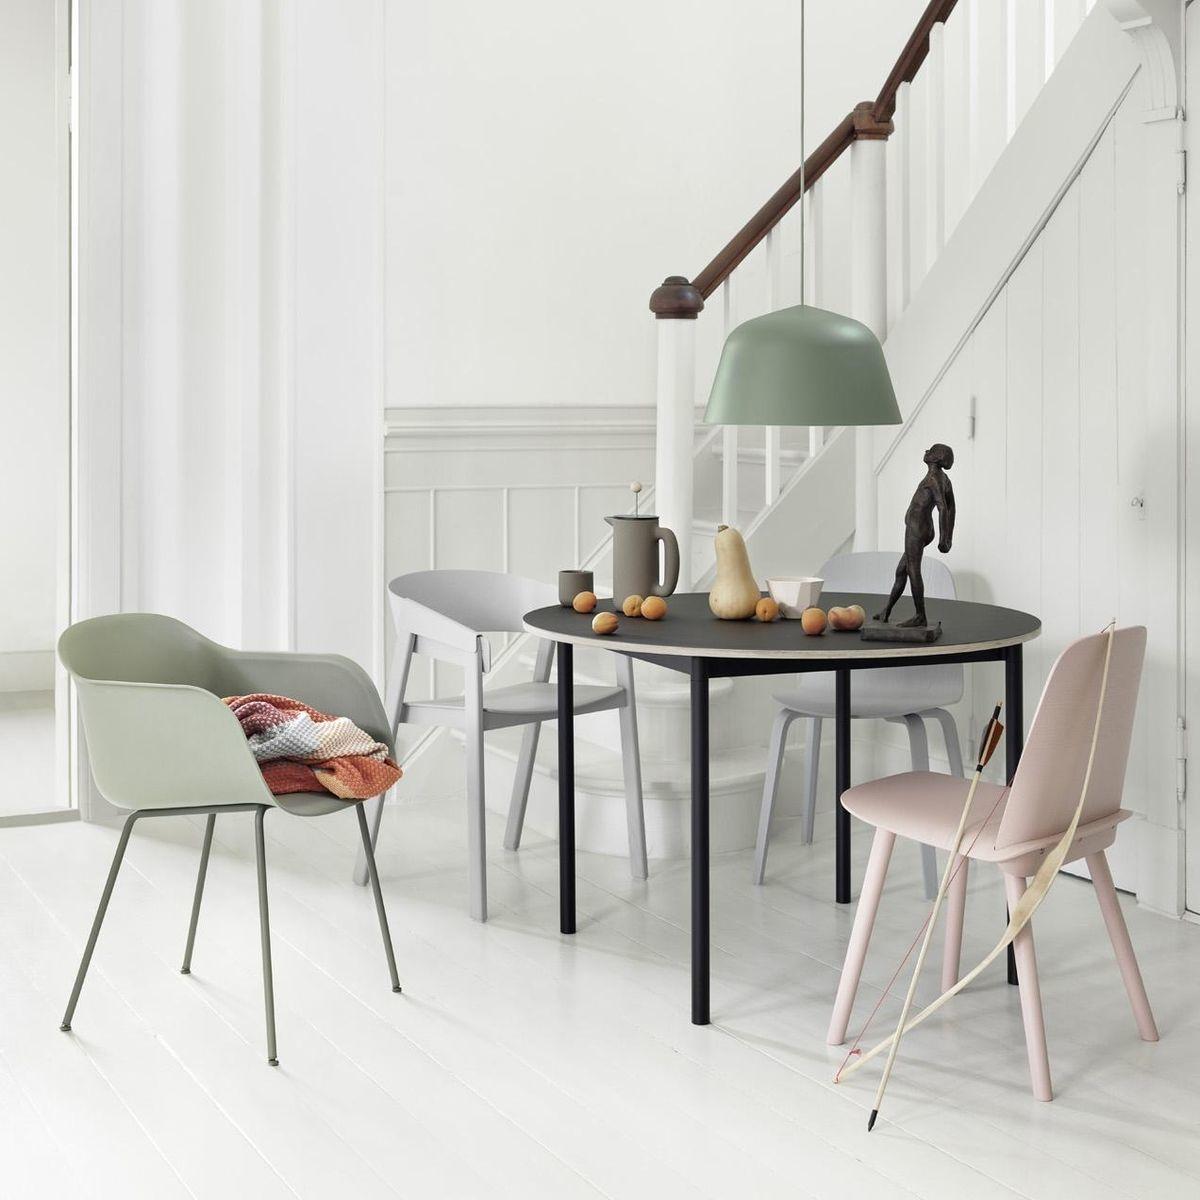 muuto nerd chair muuto. Black Bedroom Furniture Sets. Home Design Ideas